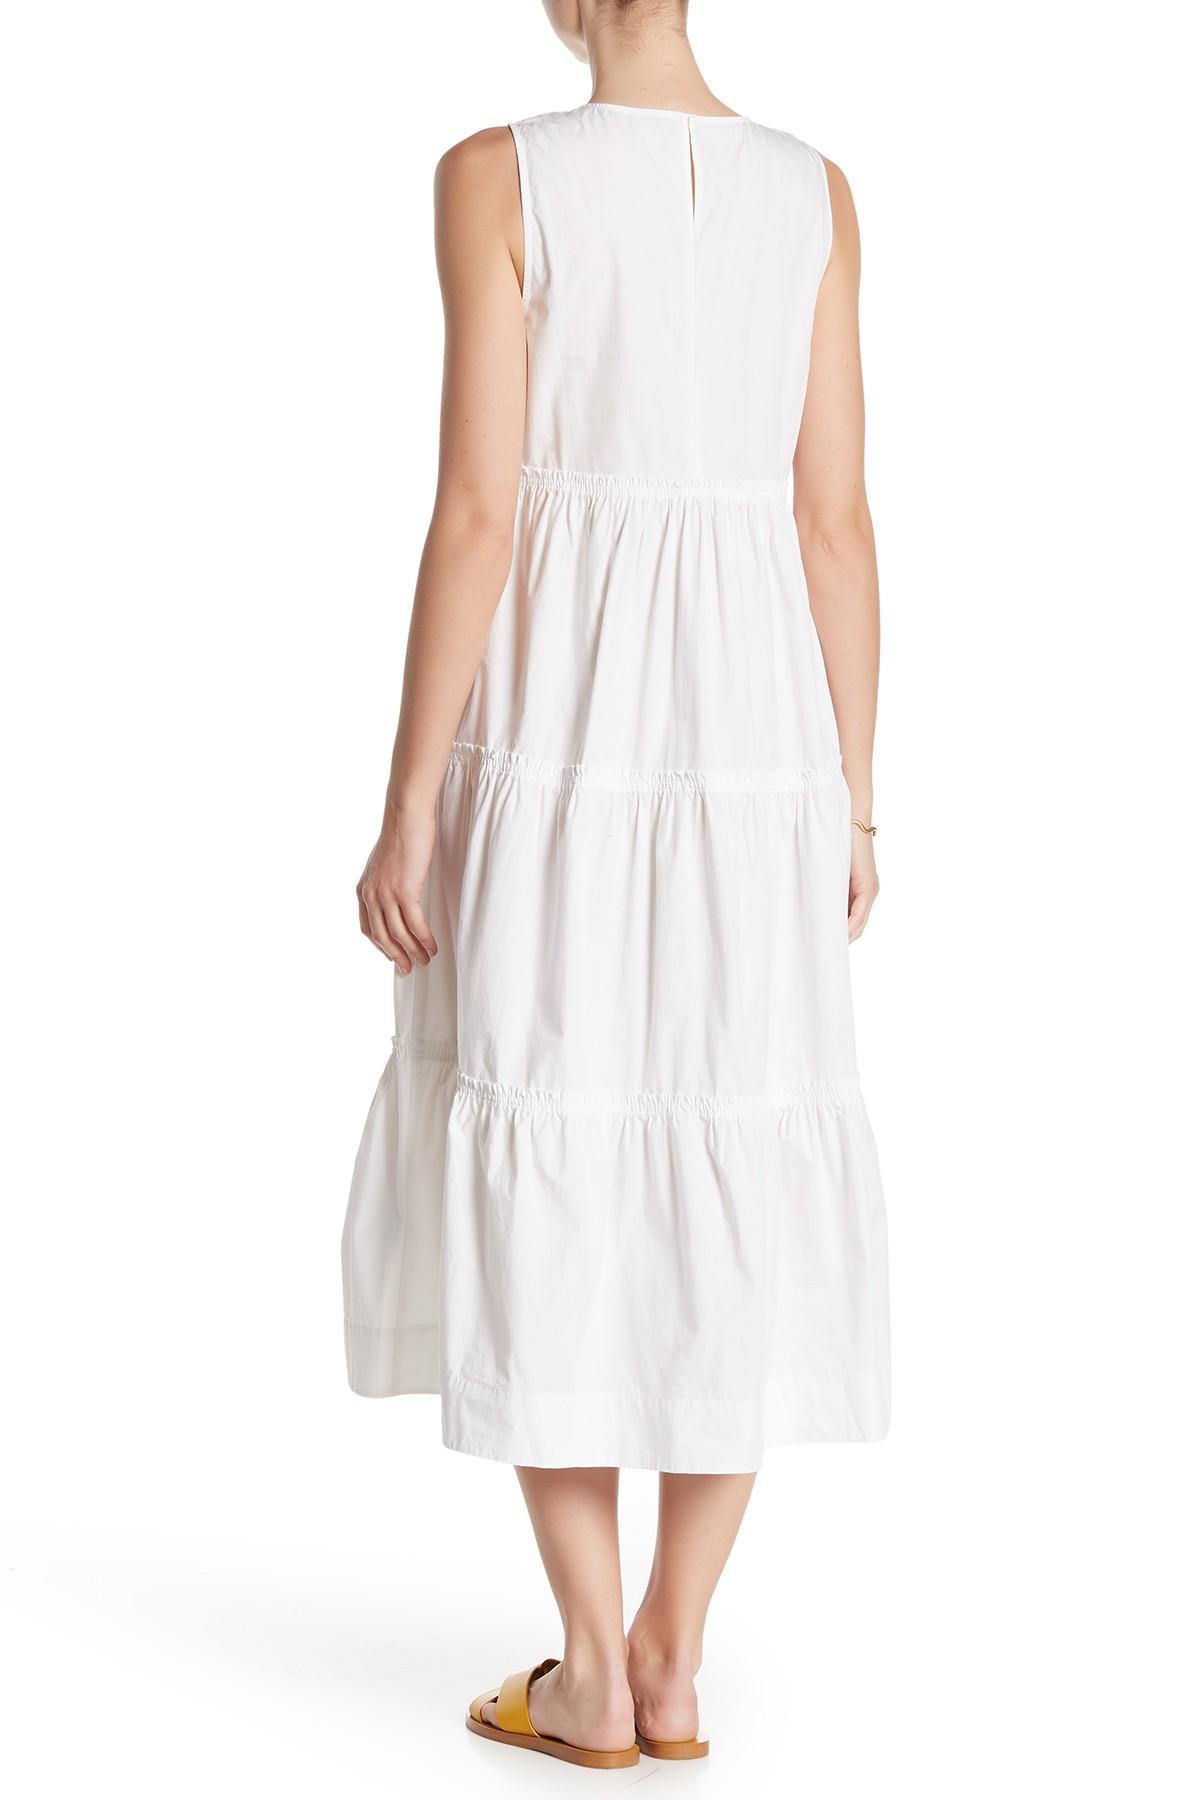 d936f6bd9b5 Madewell - White Cattail Tiered Dress - Lyst. View fullscreen